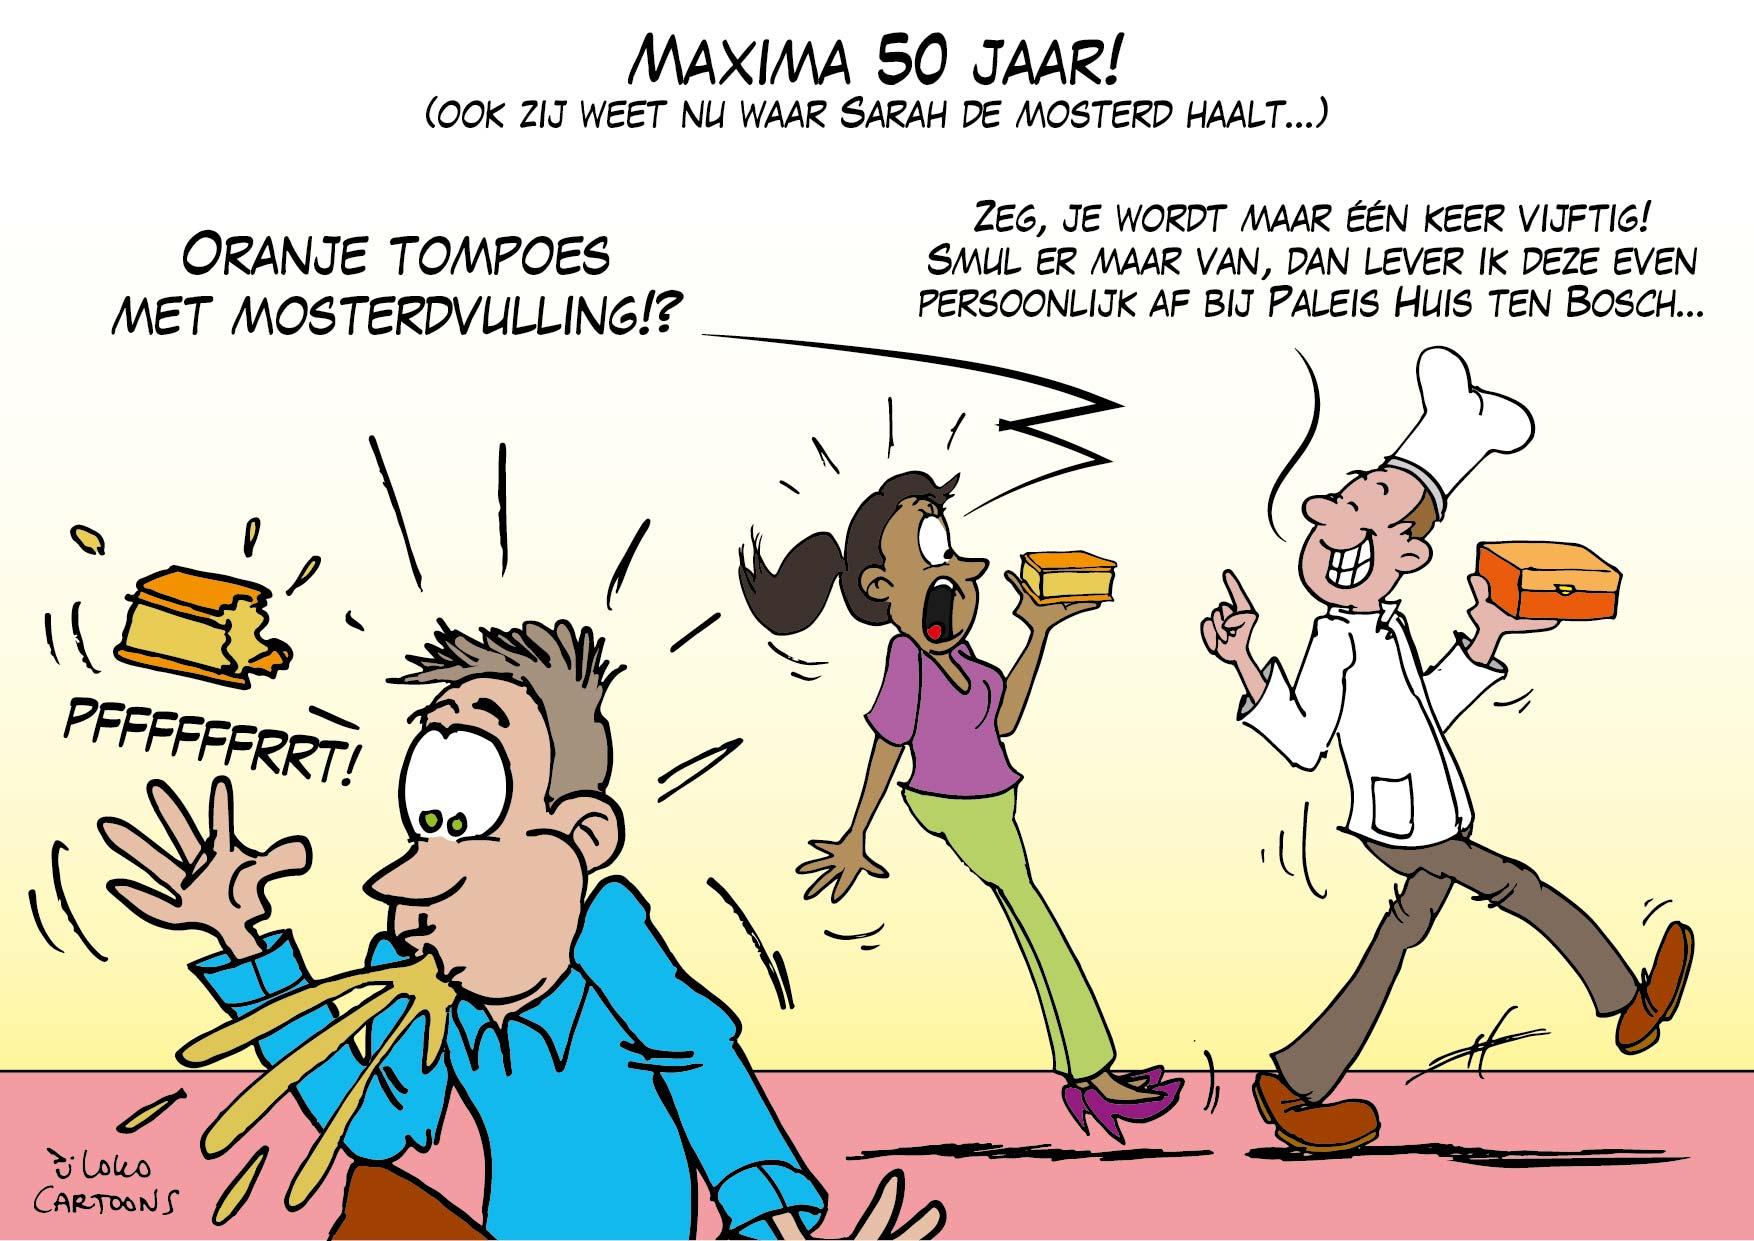 Maxima 50 jaar…